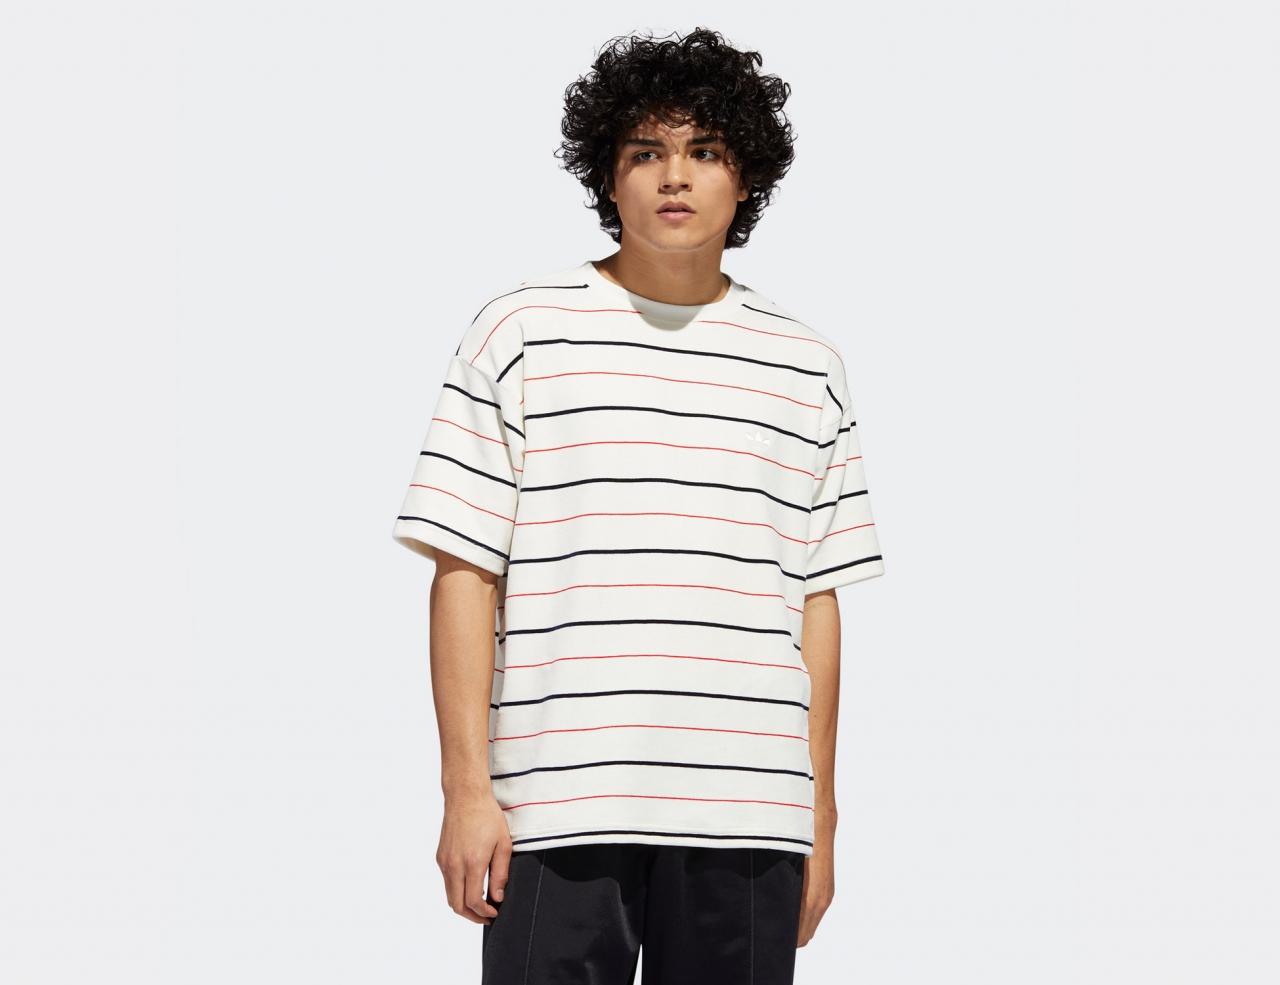 Adidas Velour Jersey Shirt - Oyster White / Navy / Scarlet